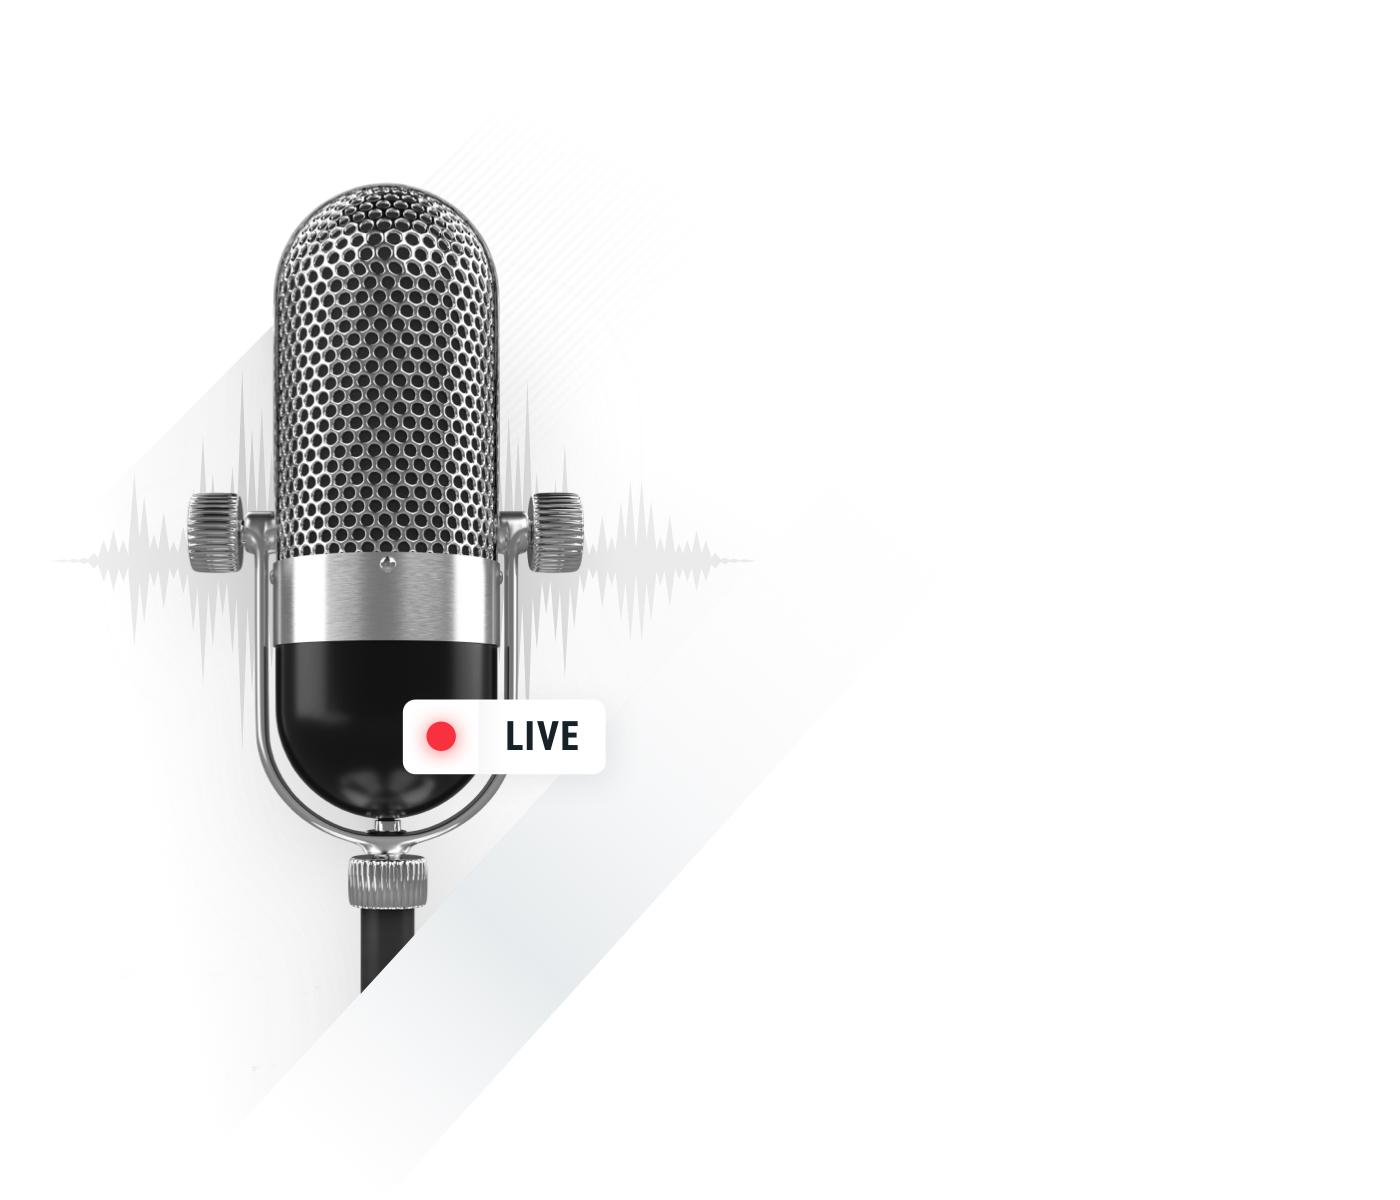 KV_Q&A_live_event_form